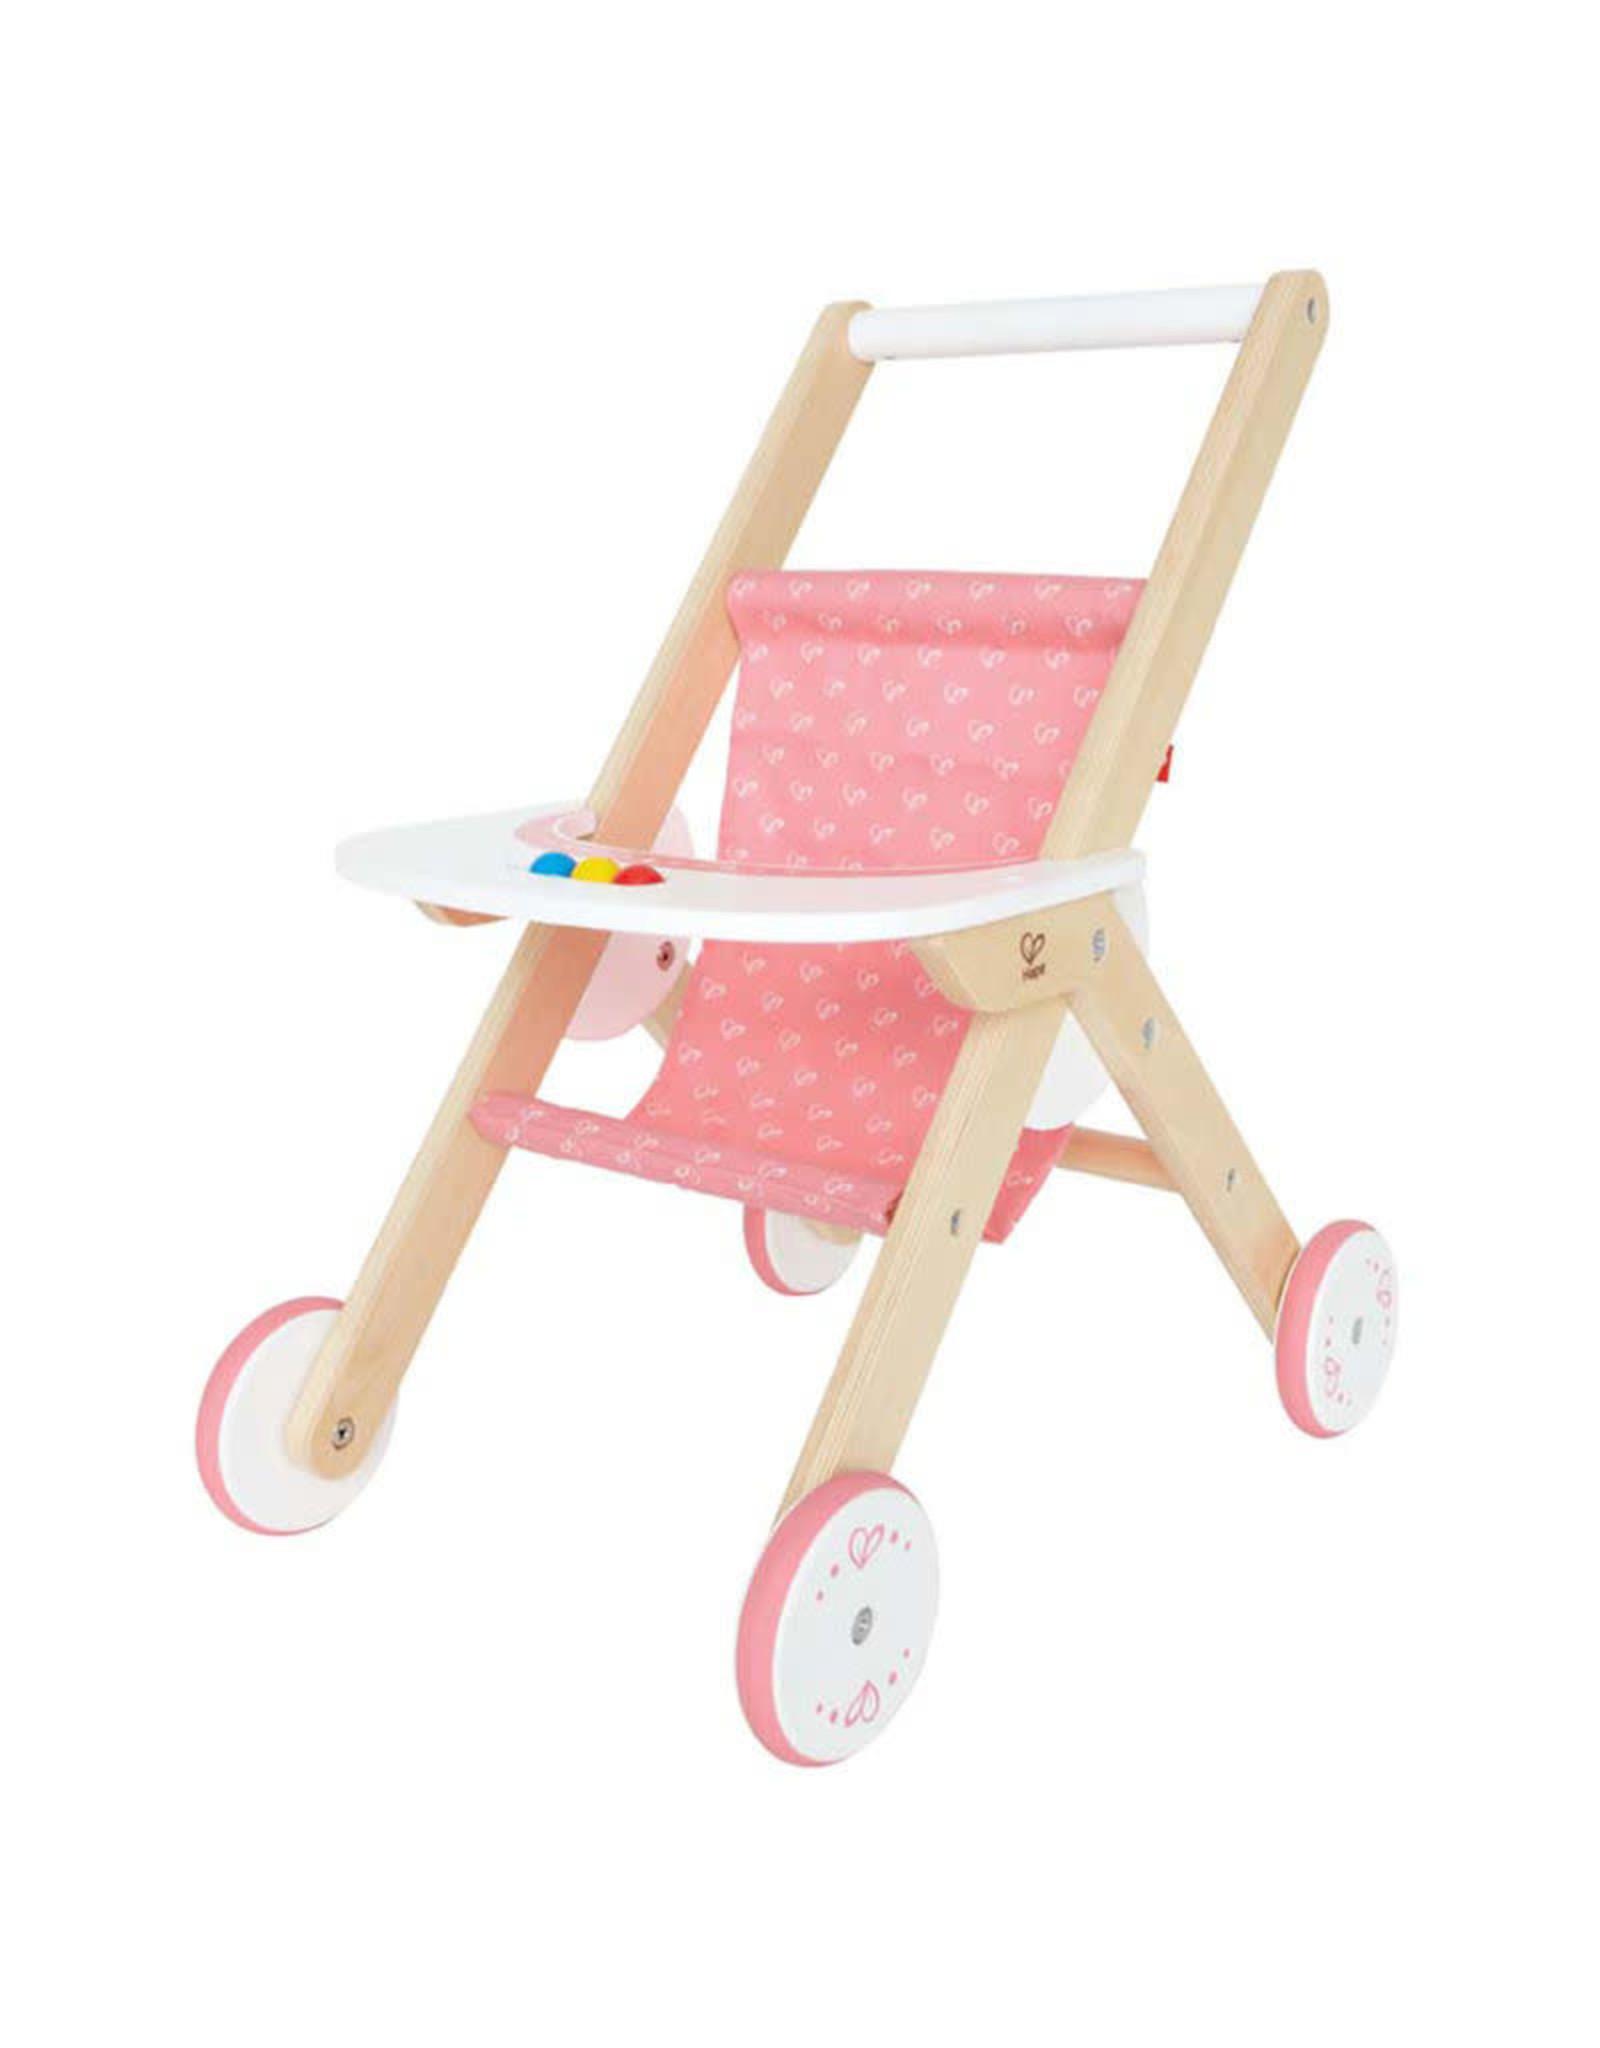 Hape Wooden Doll Stroller